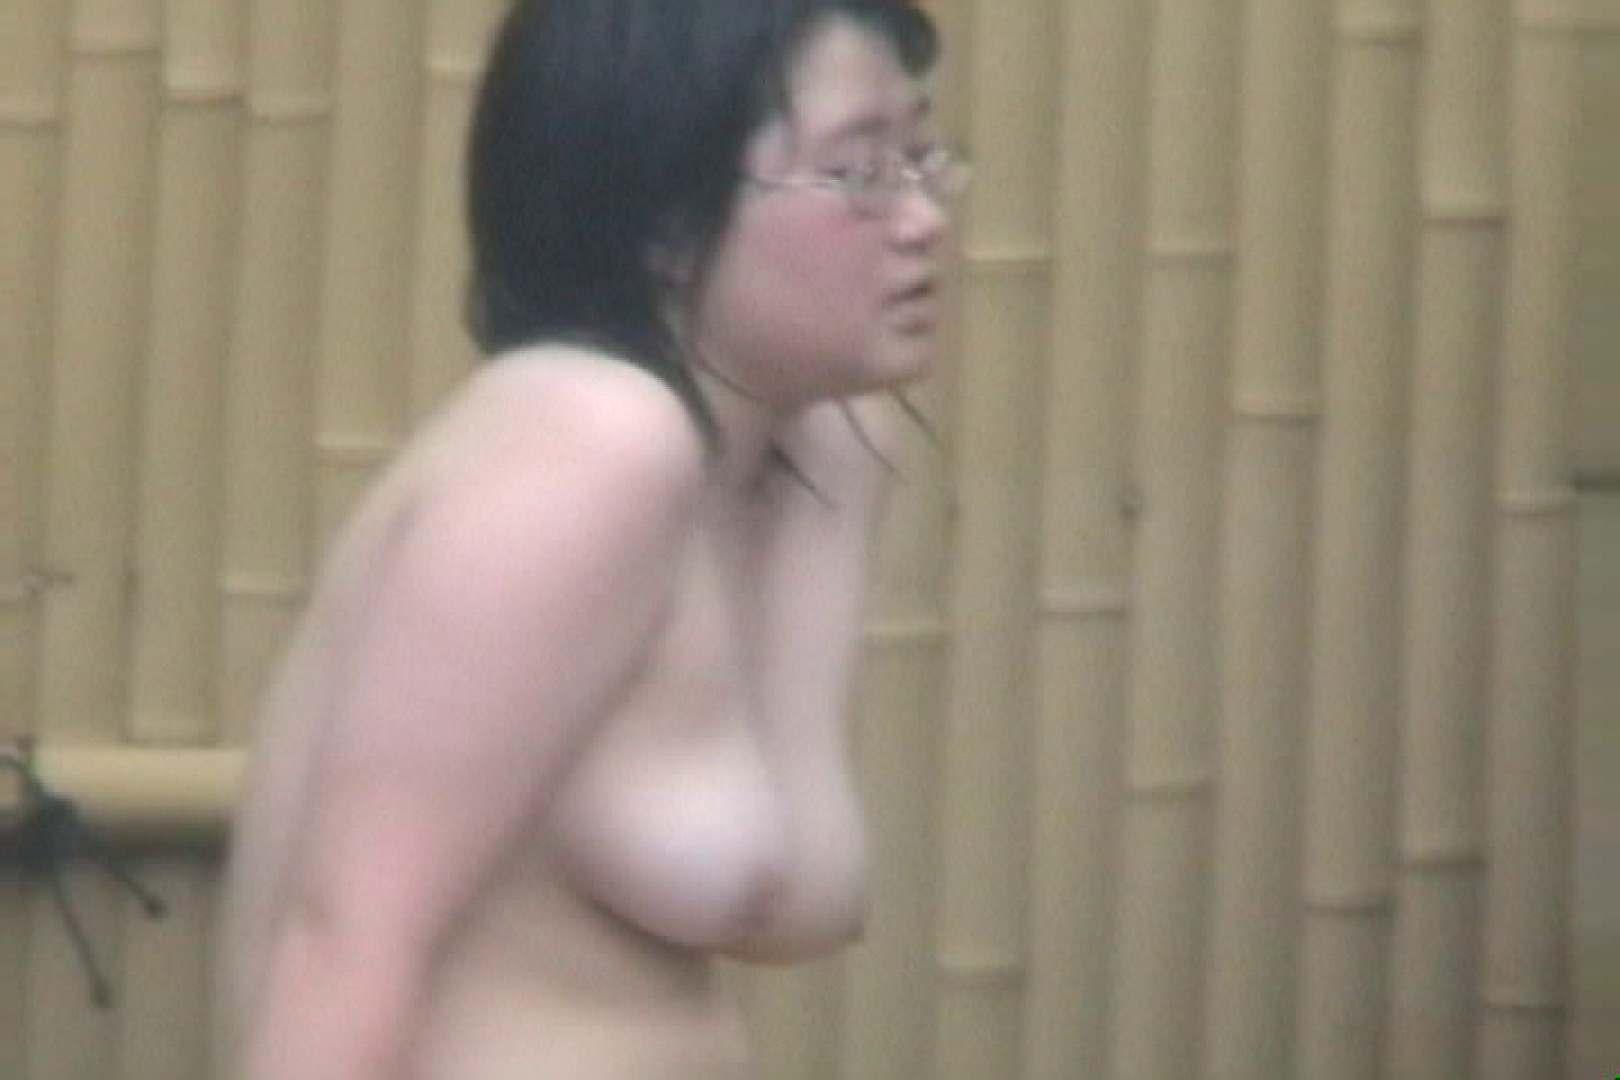 Aquaな露天風呂Vol.46【VIP限定】 女体盗撮 | 露天  98連発 67